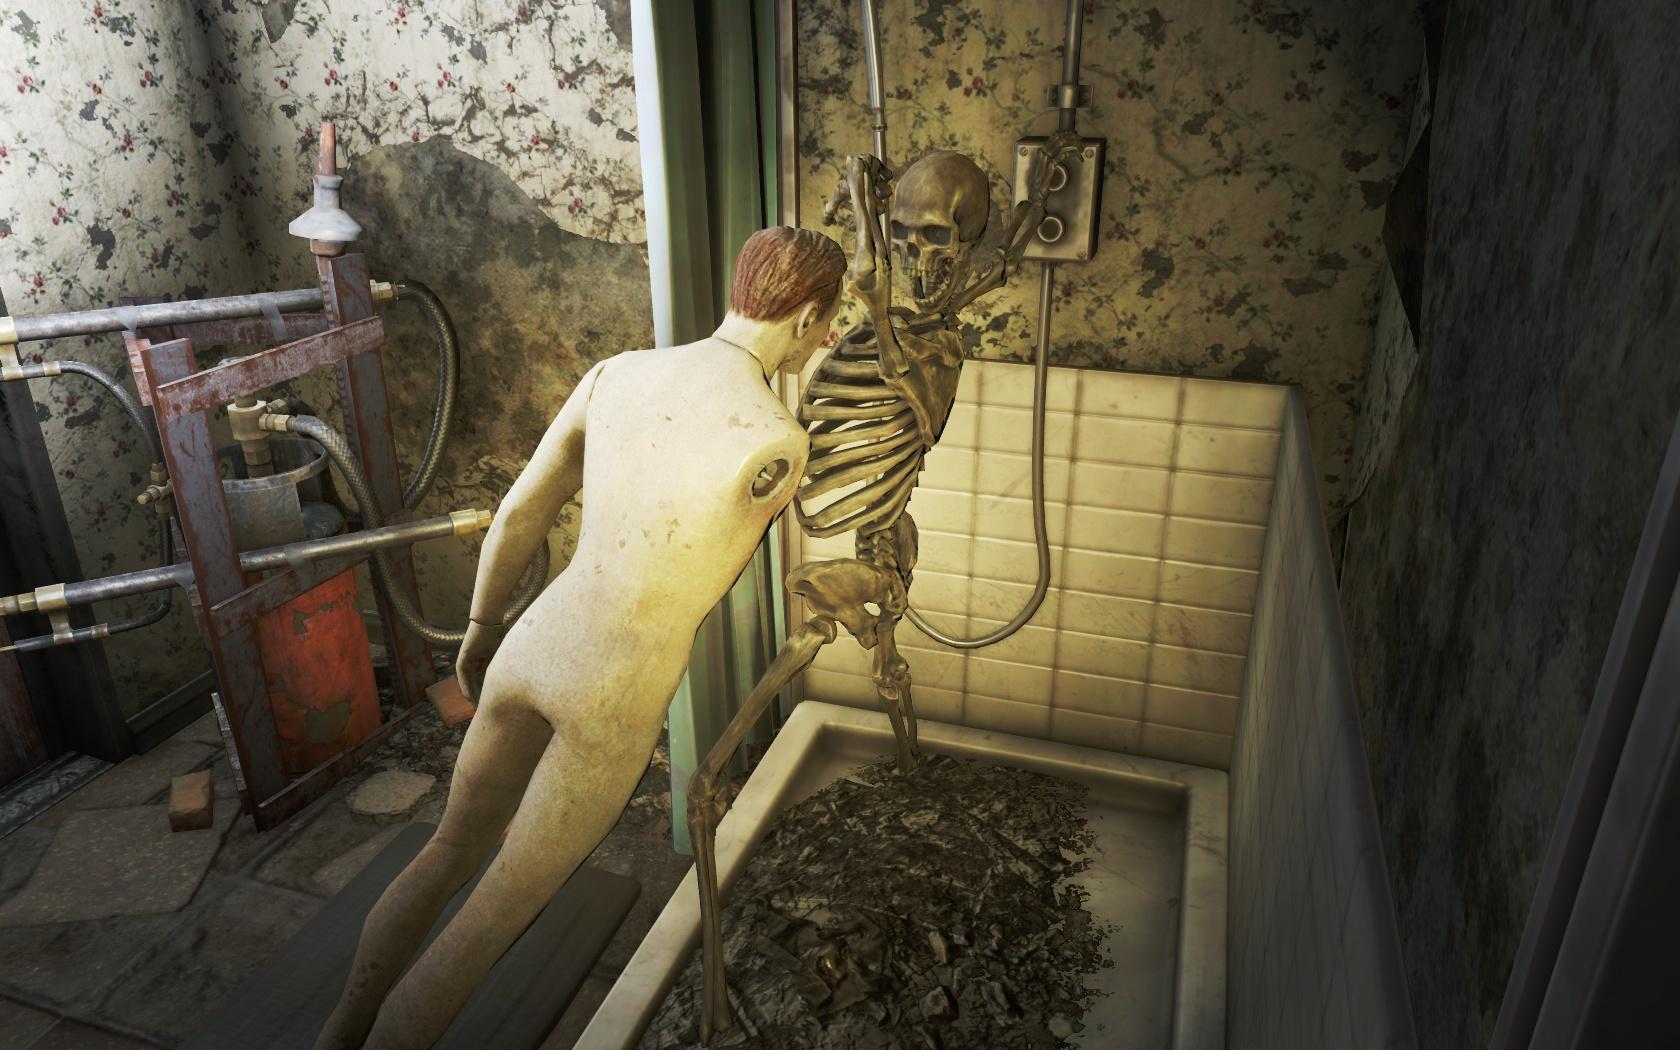 Душевая (Ядер-Мир, Павильон смеха) - Fallout 4 Nuka World, Павильон смеха, Скелет, Ядер-Мир